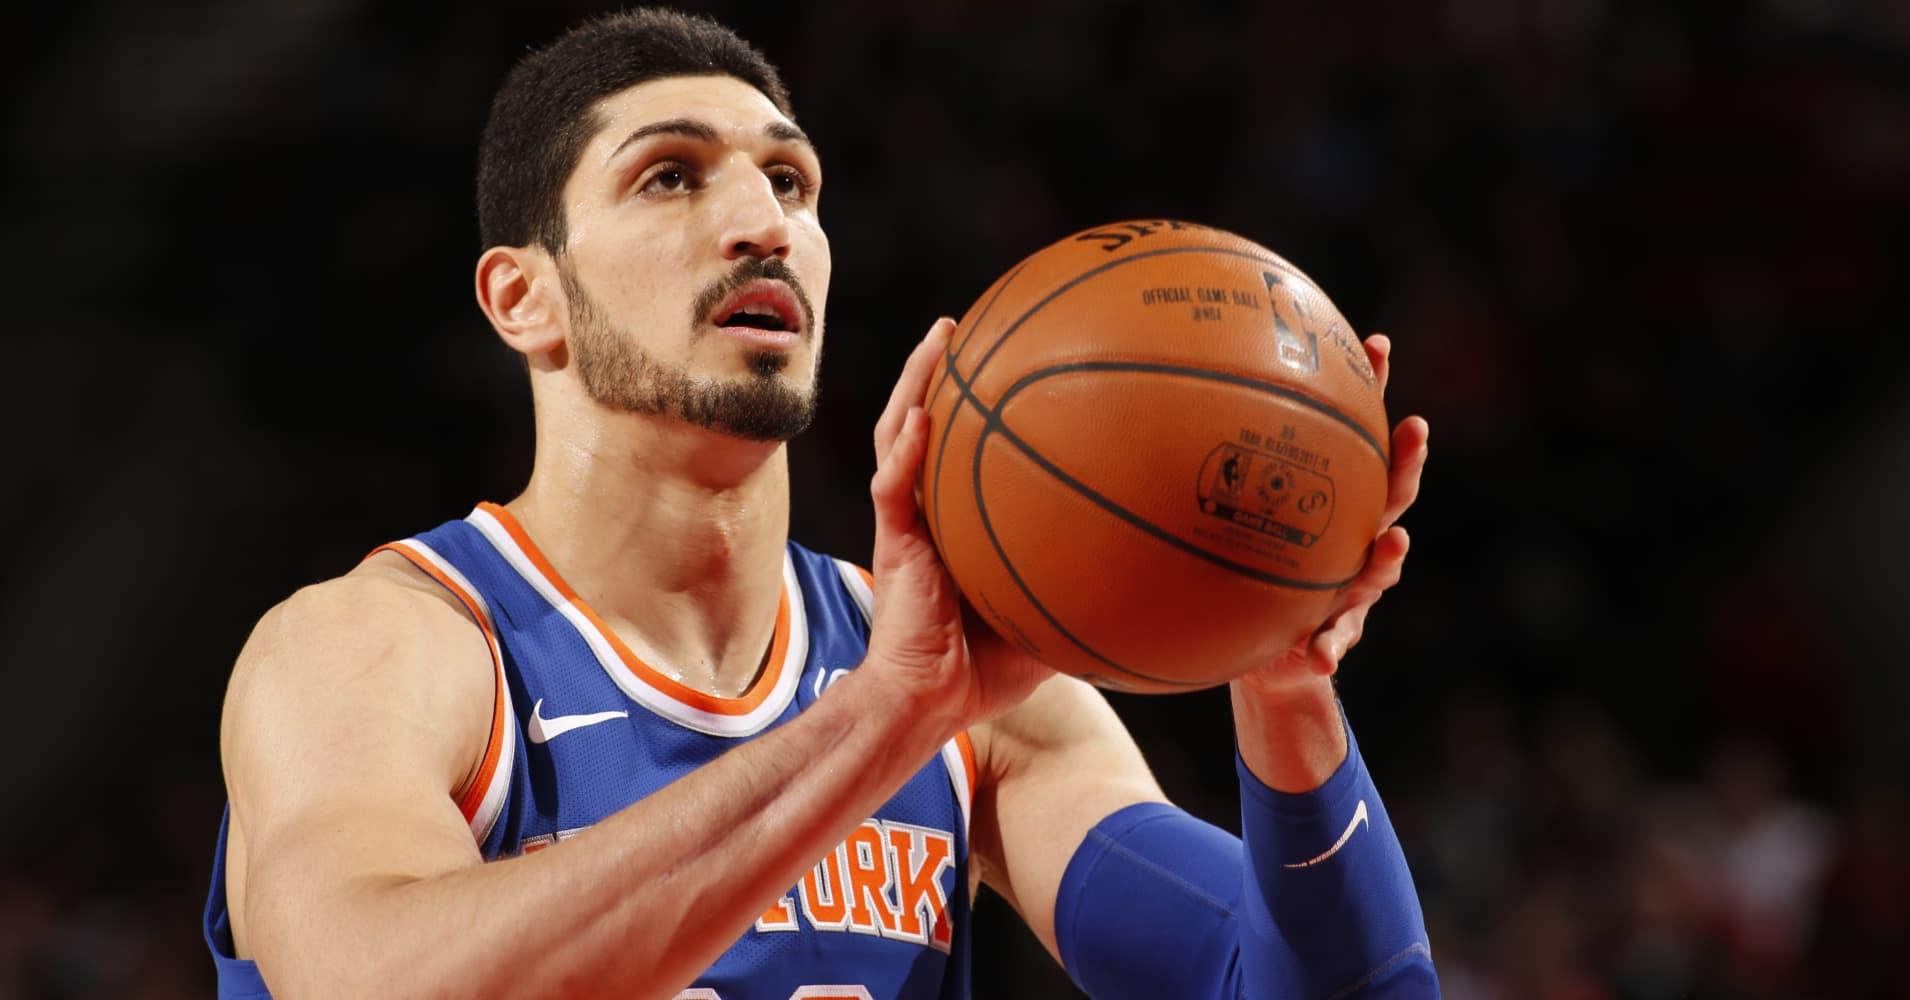 How NBA Knicks star Enes Kanter spent his first big basketball paycheck